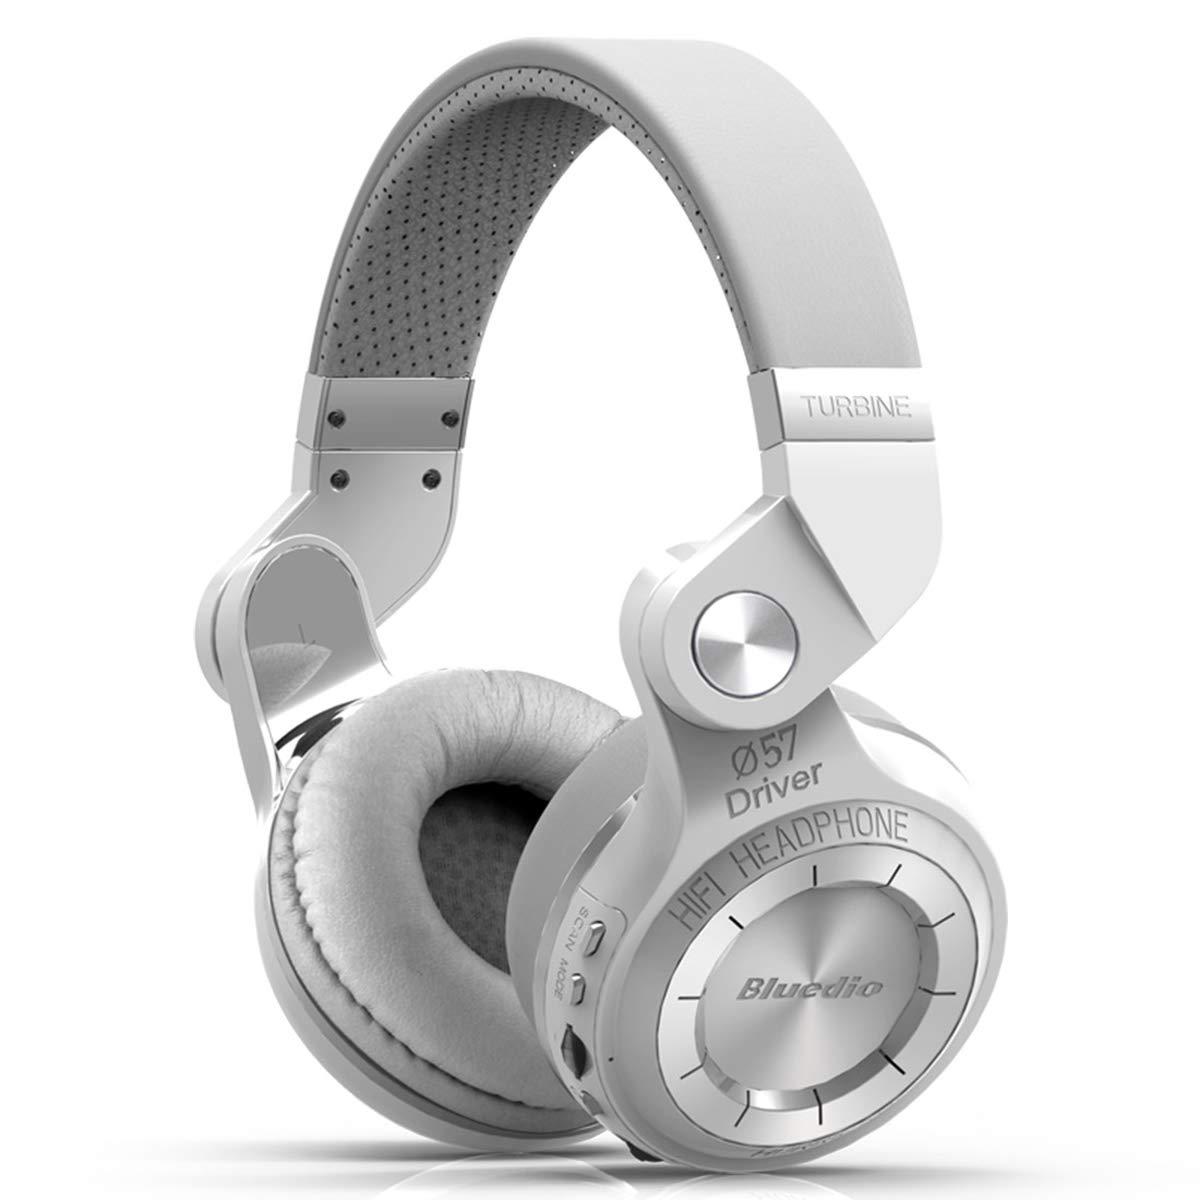 Bluedio T2 Plus Turbine Wireless Bluetooth Headphones with Mic/Micro SD Card Slot/FM Radio (White)